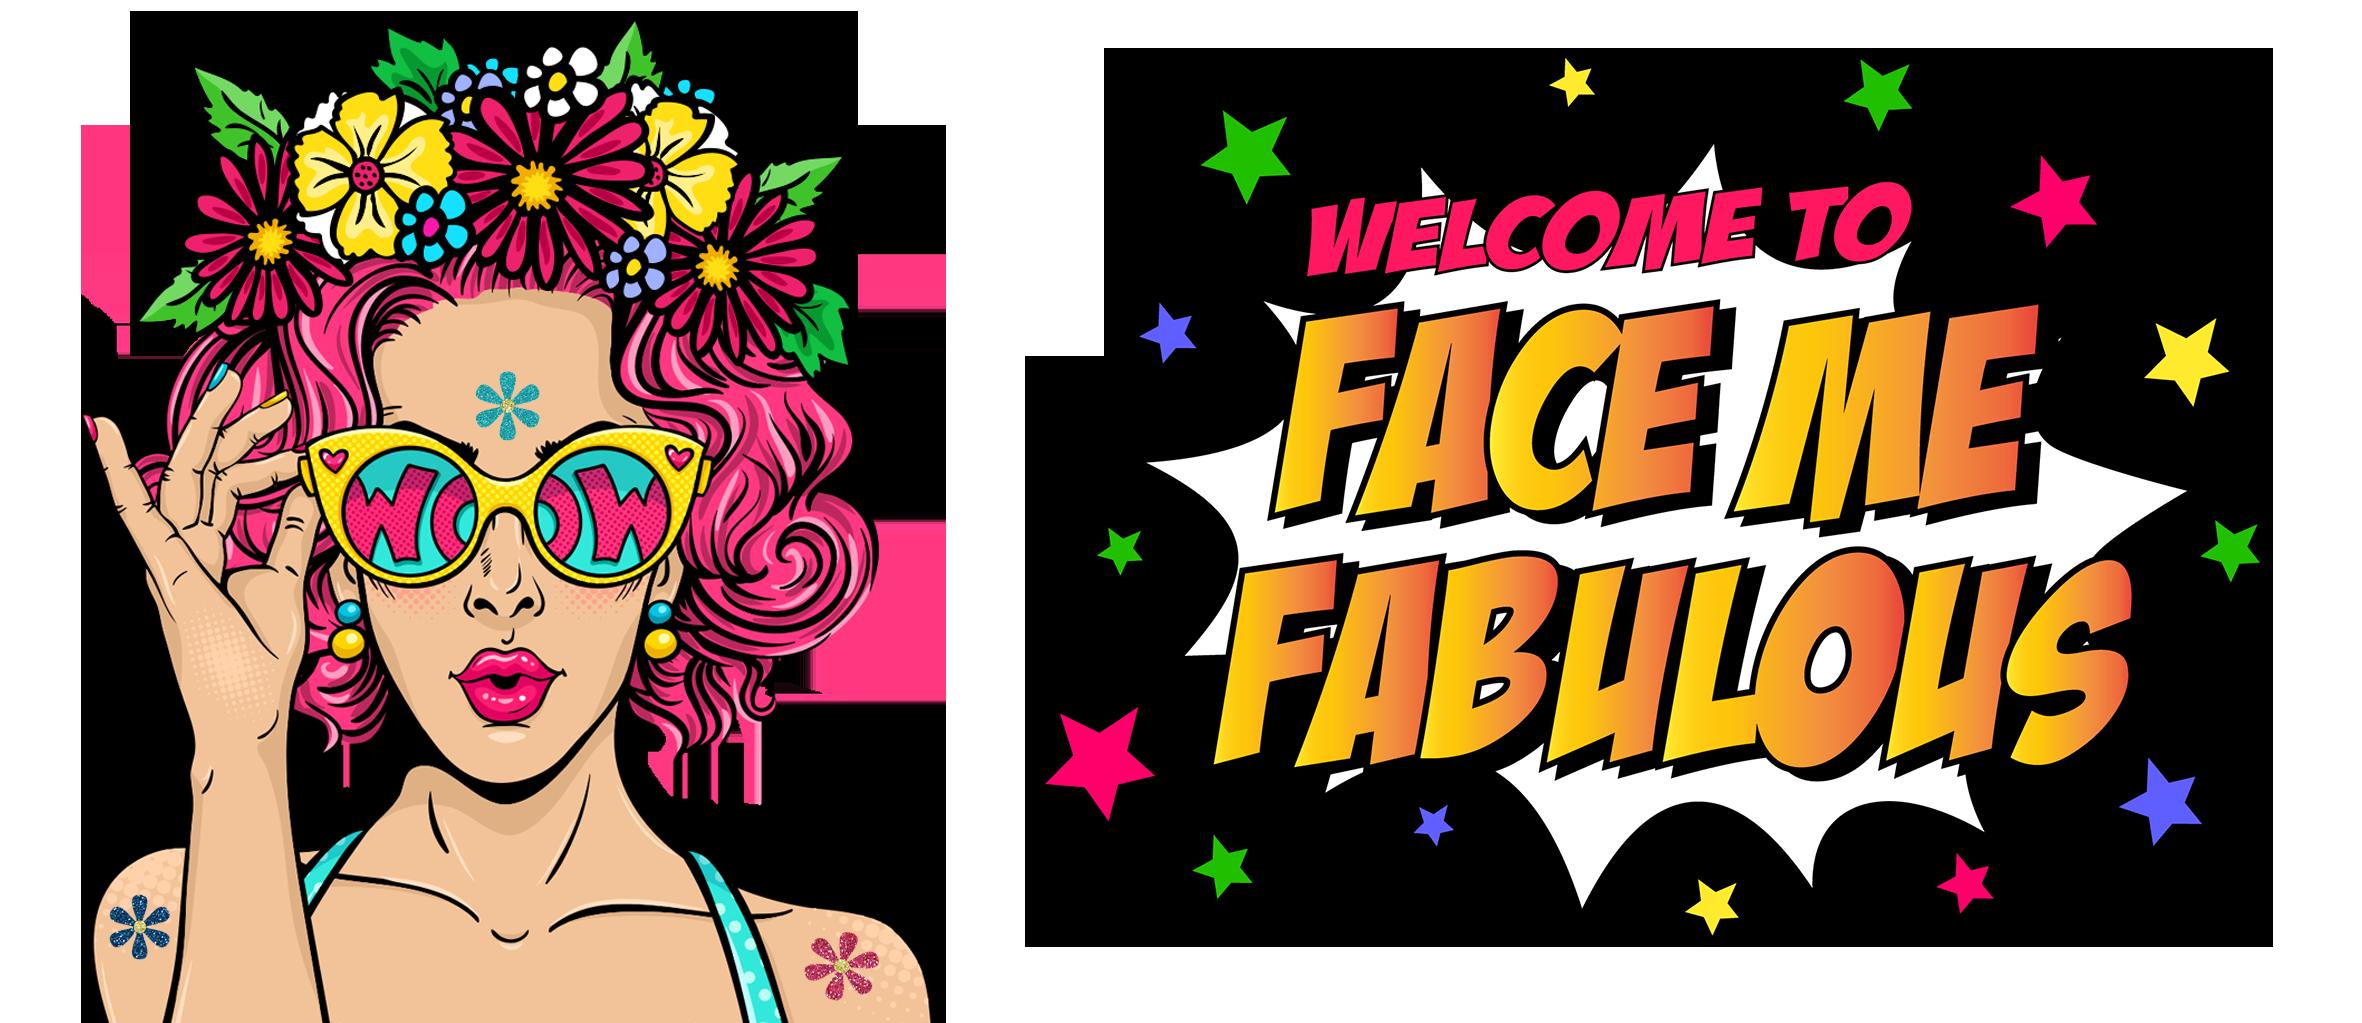 Face Me Fabulous Banner Image